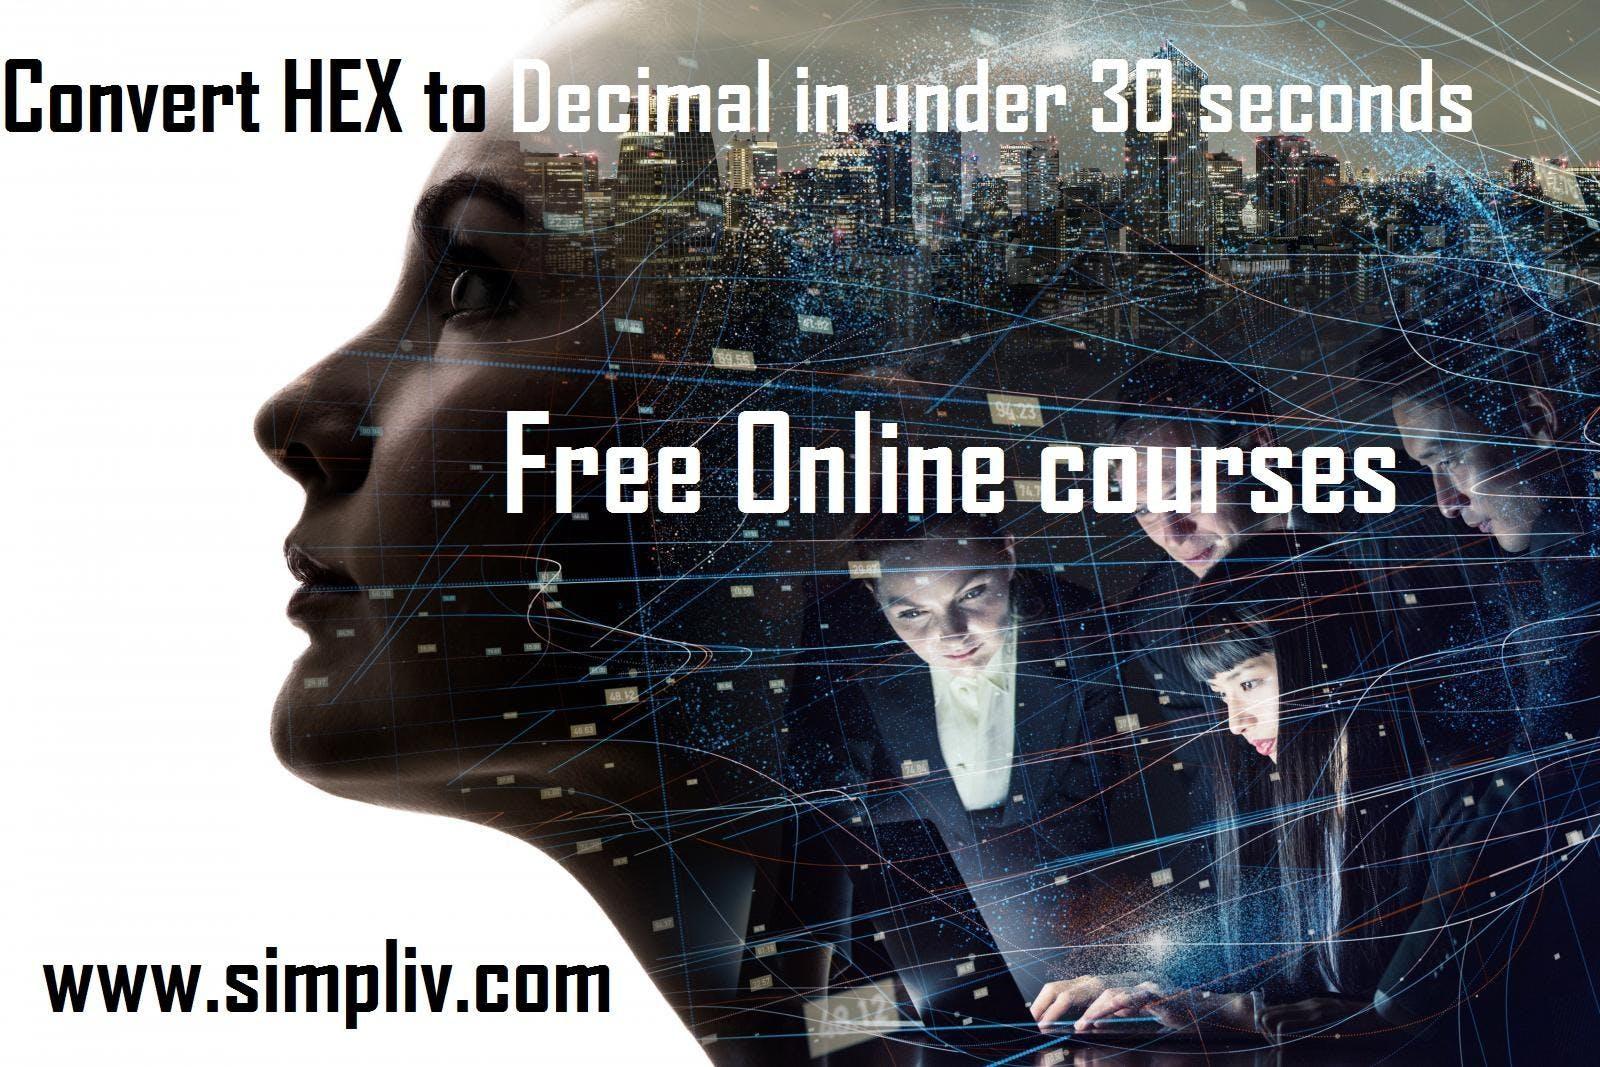 Convert HEX to Decimal in under 30 seconds! - Simpliv (FREE)